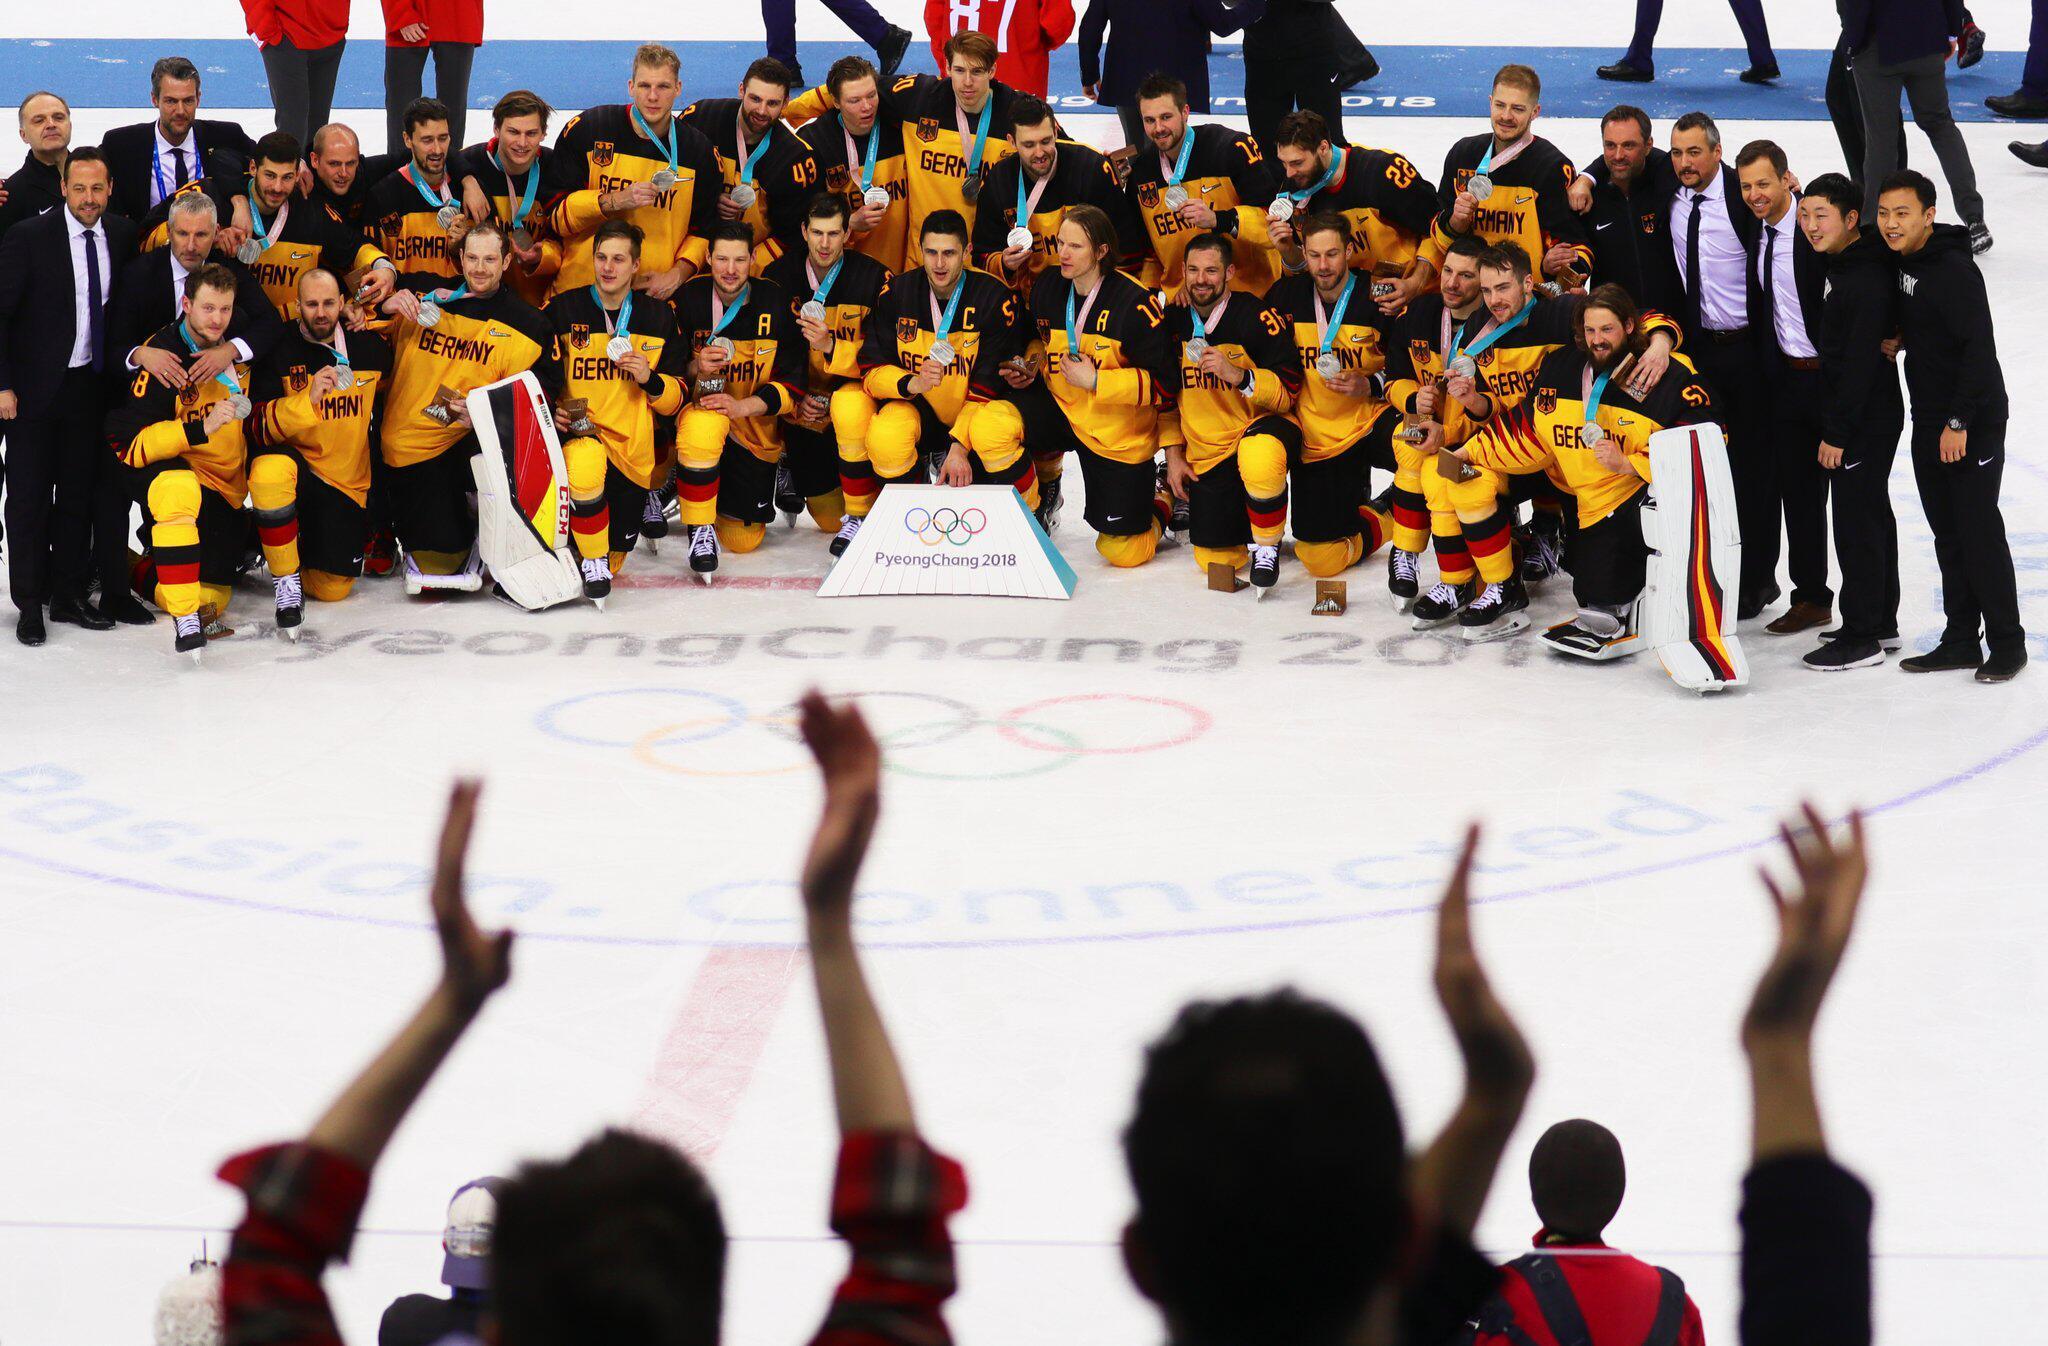 Bild zu Pyeongchang 2018, Eishockey